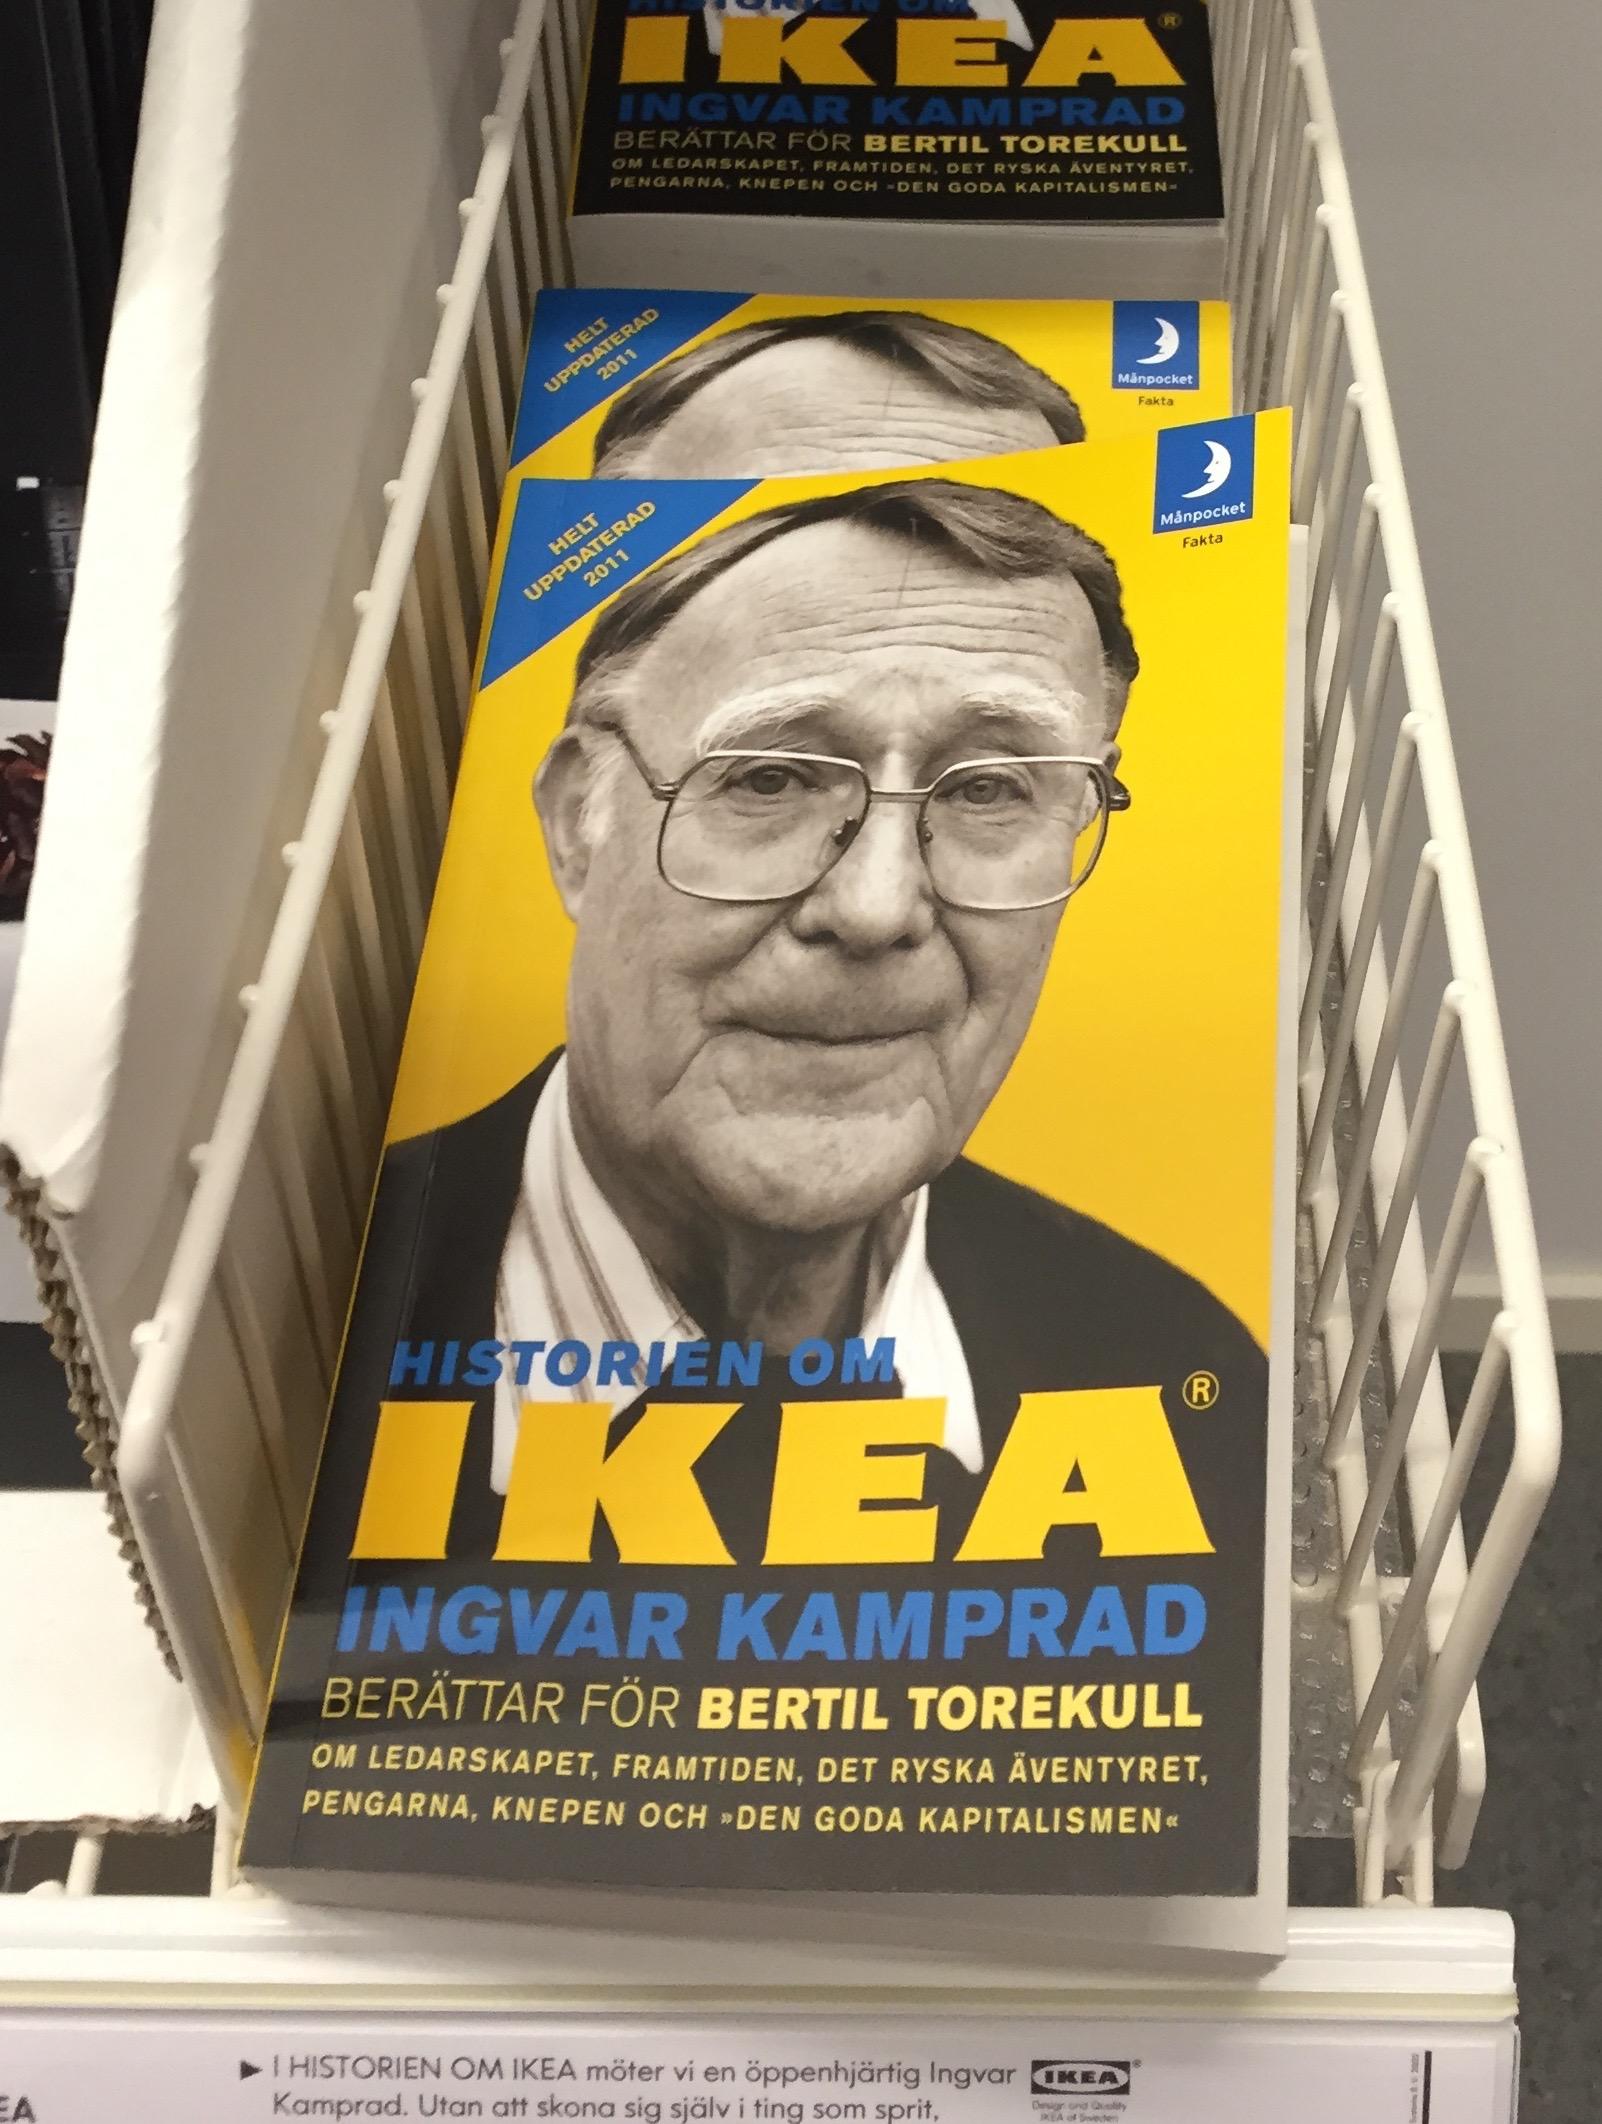 Bedeutung Der Ikea Abkürzung Ingvar Kamprad Elmtaryd Agunnaryd